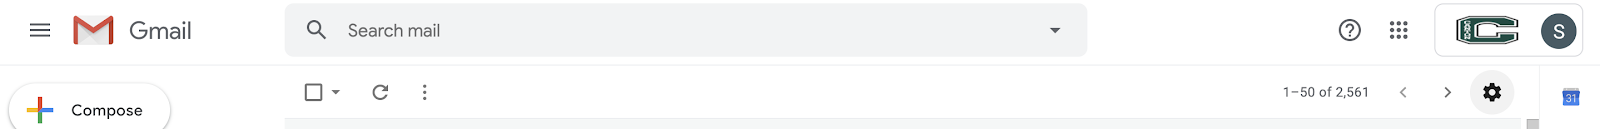 Gmail search gear icon